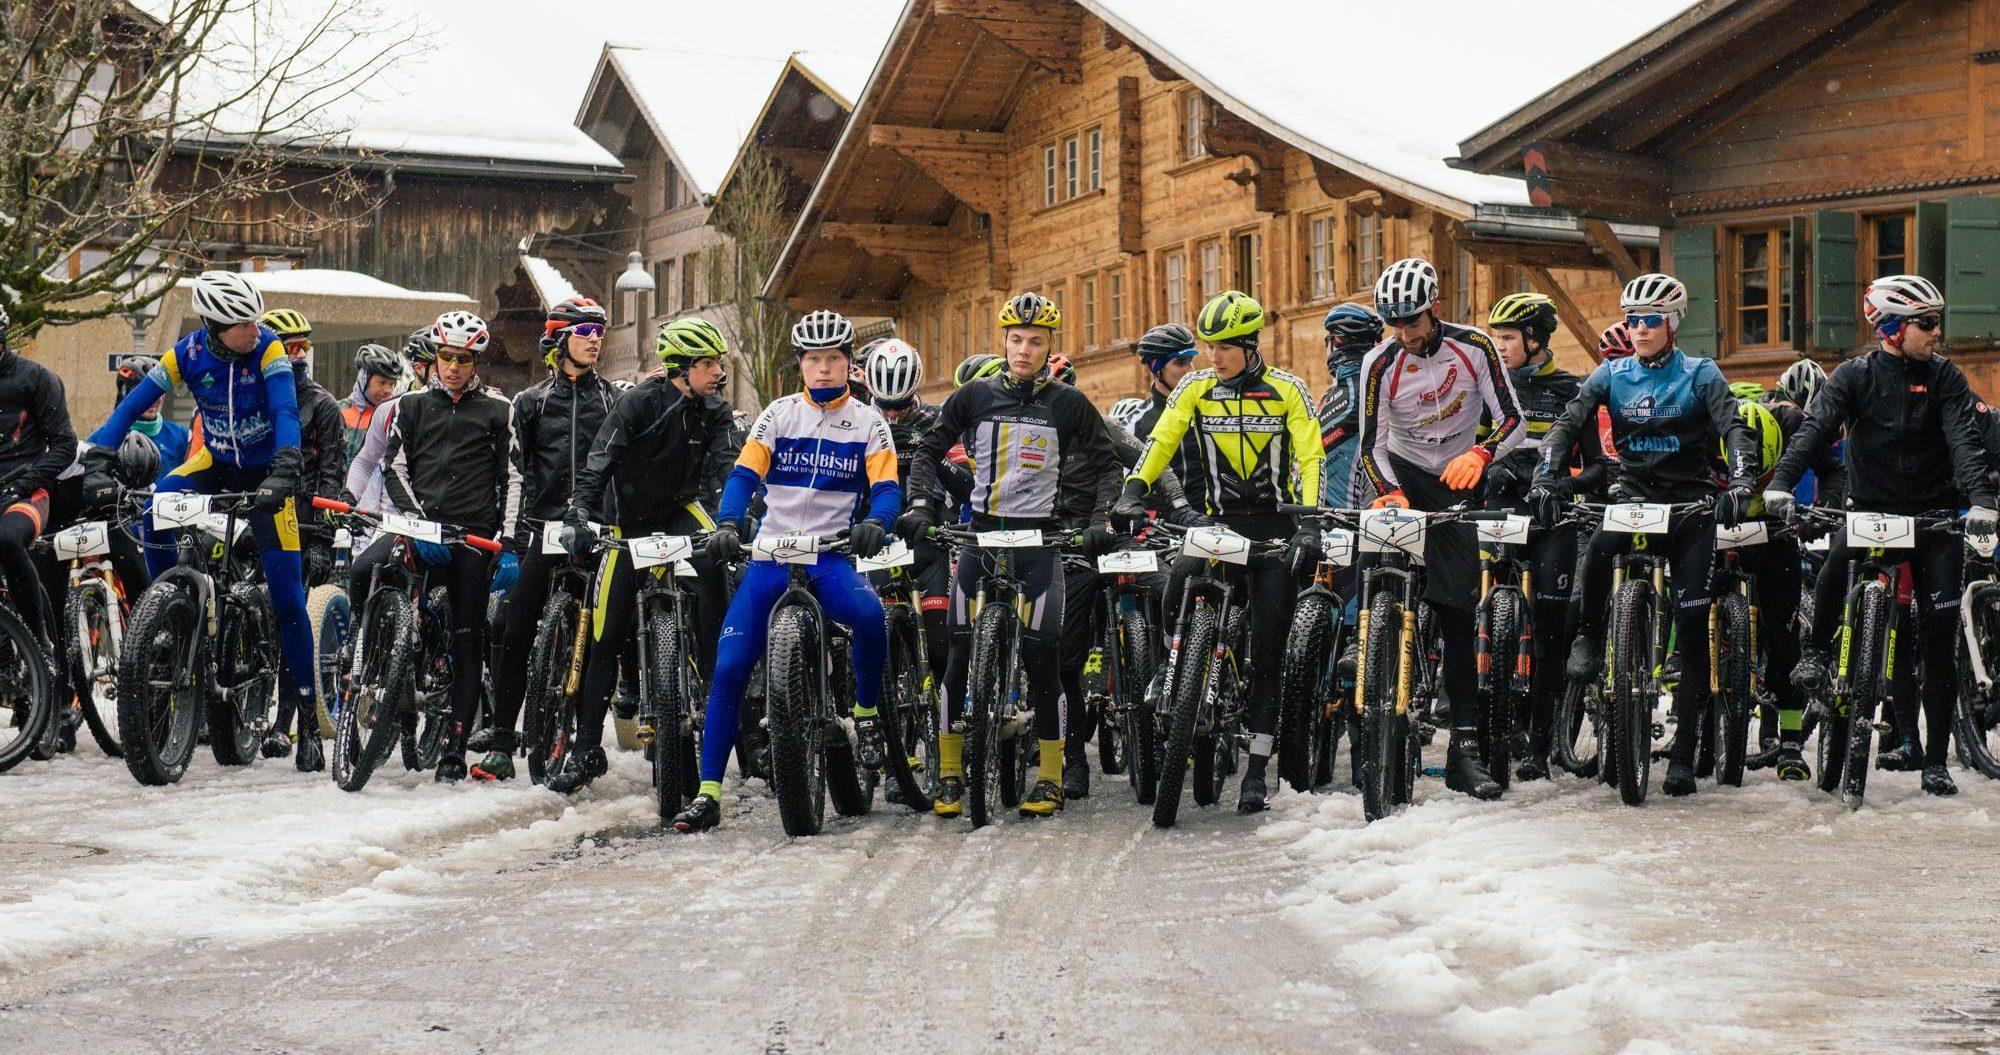 Maciej Stanowicz (Mitsubishi Materials MTB Team) – Snow Bike Festival, Szwajcaria